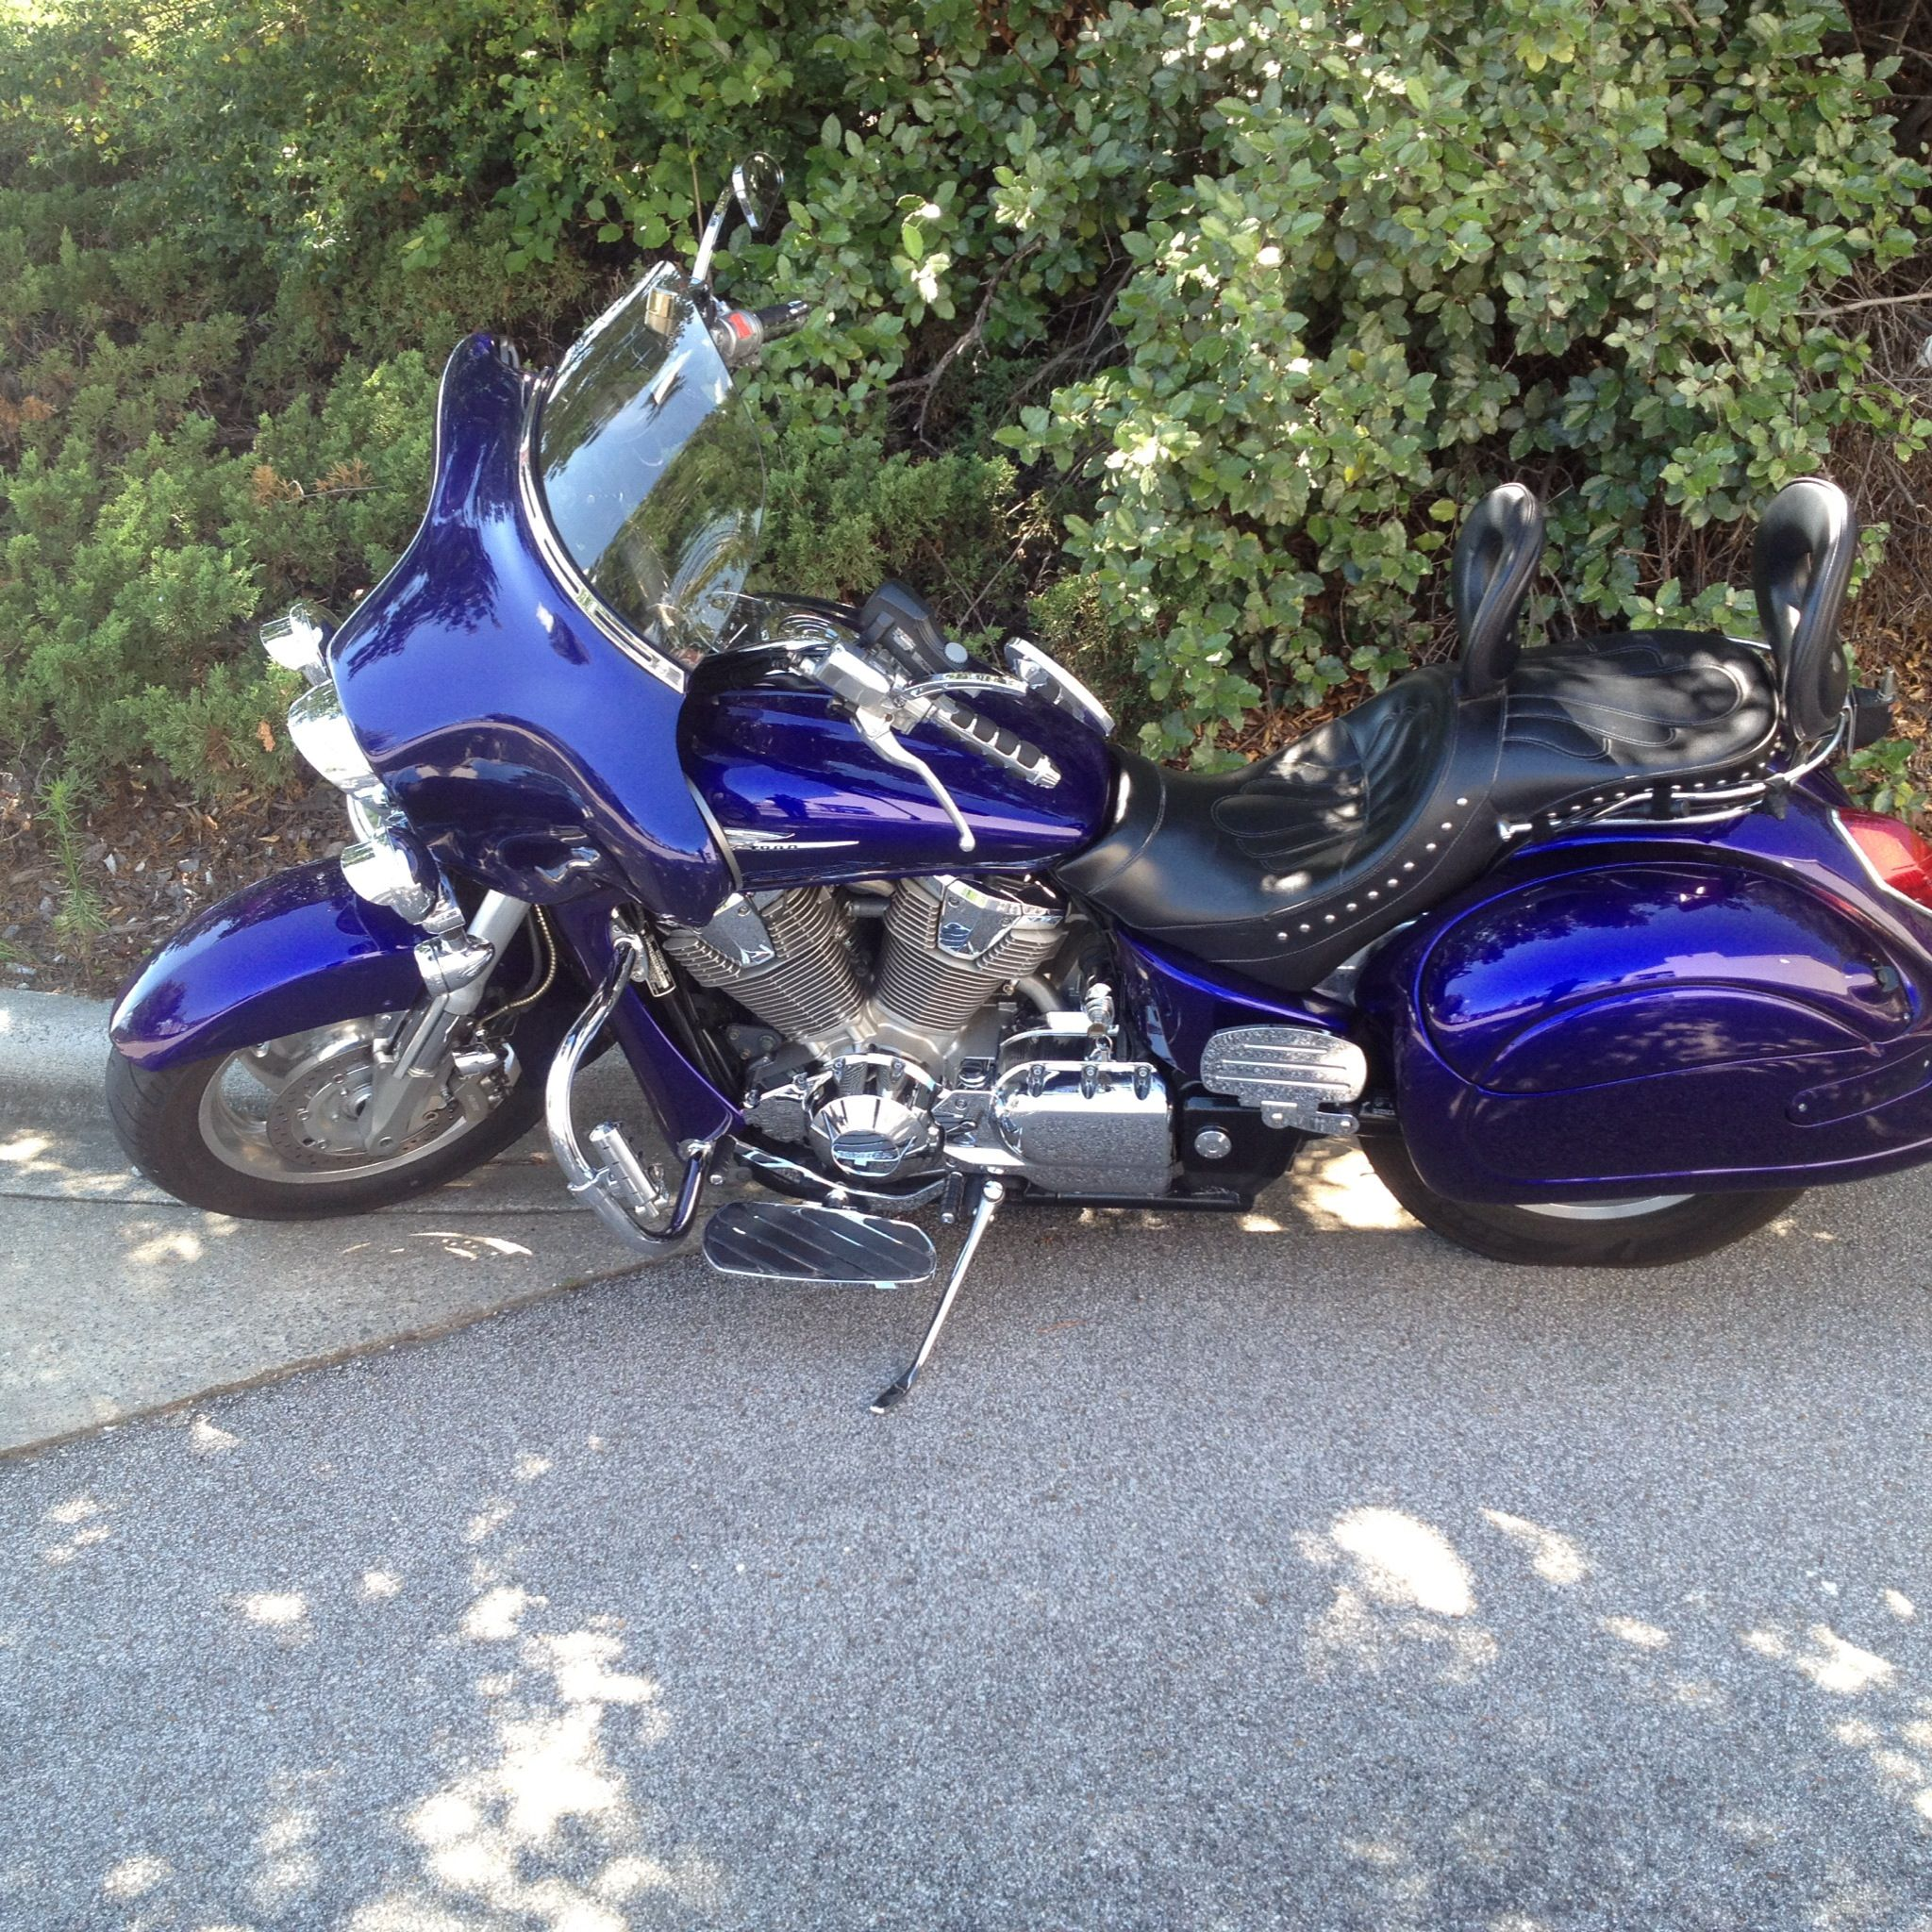 small resolution of 2003 honda vtx 1800 retro illusion blue corbin dual tourer seat beetlebags wide open customs fairing